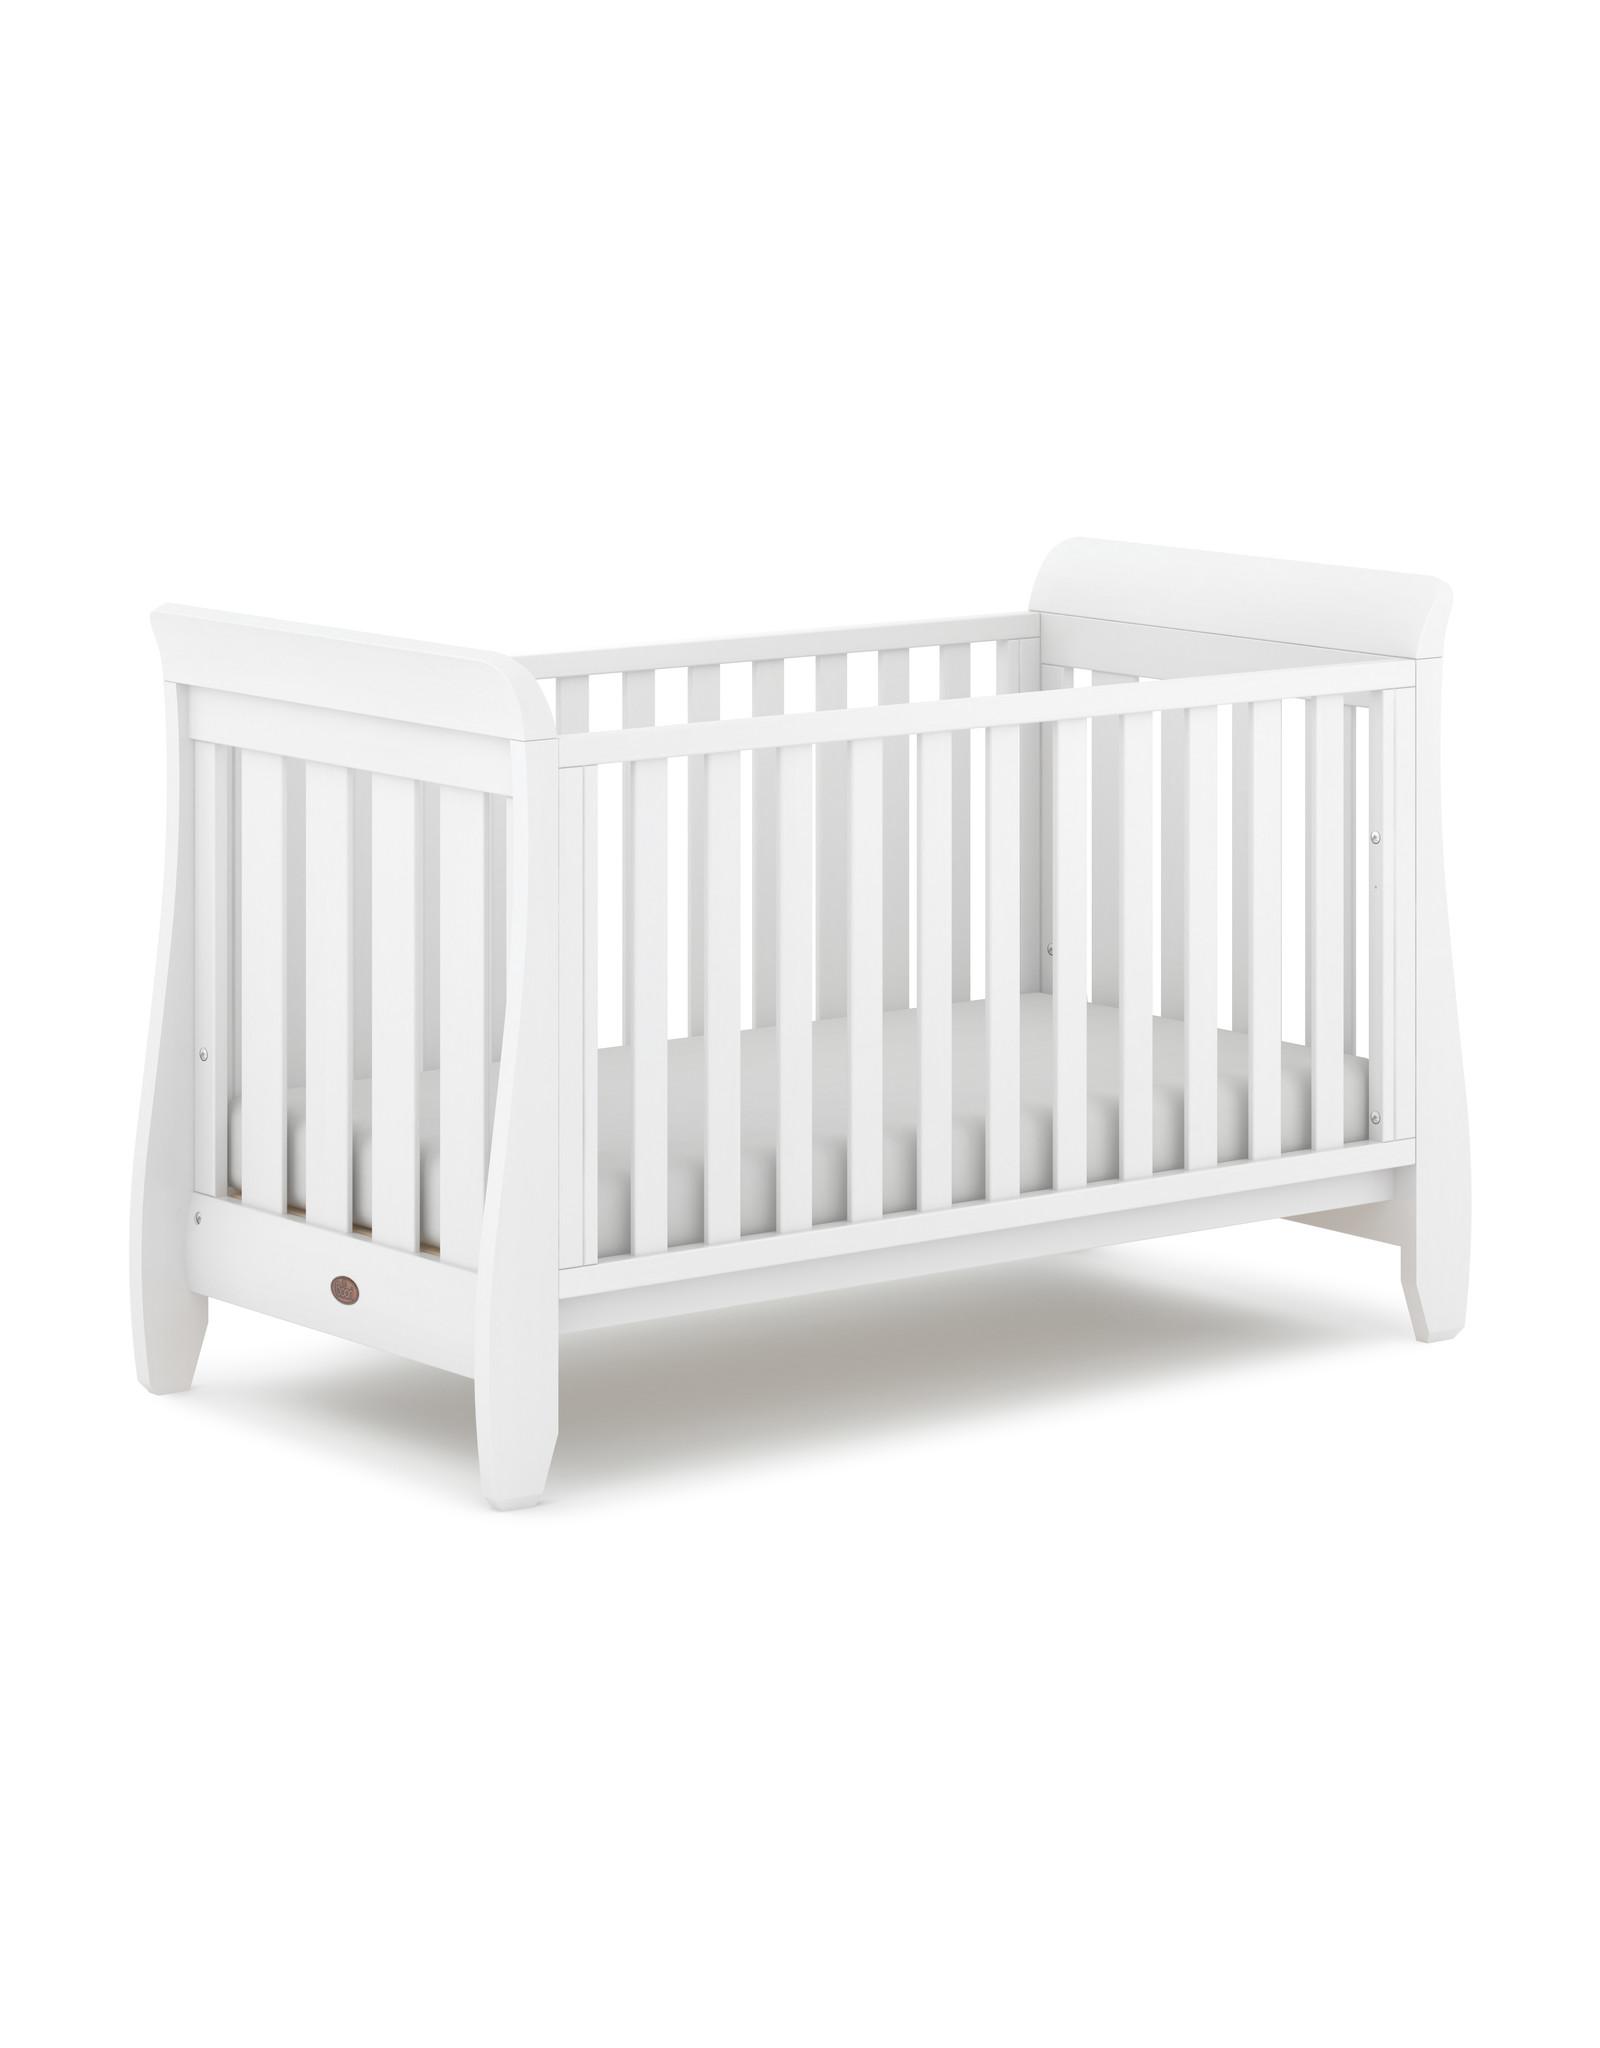 Boori BooriSleigh Urbane Cot Bed- White